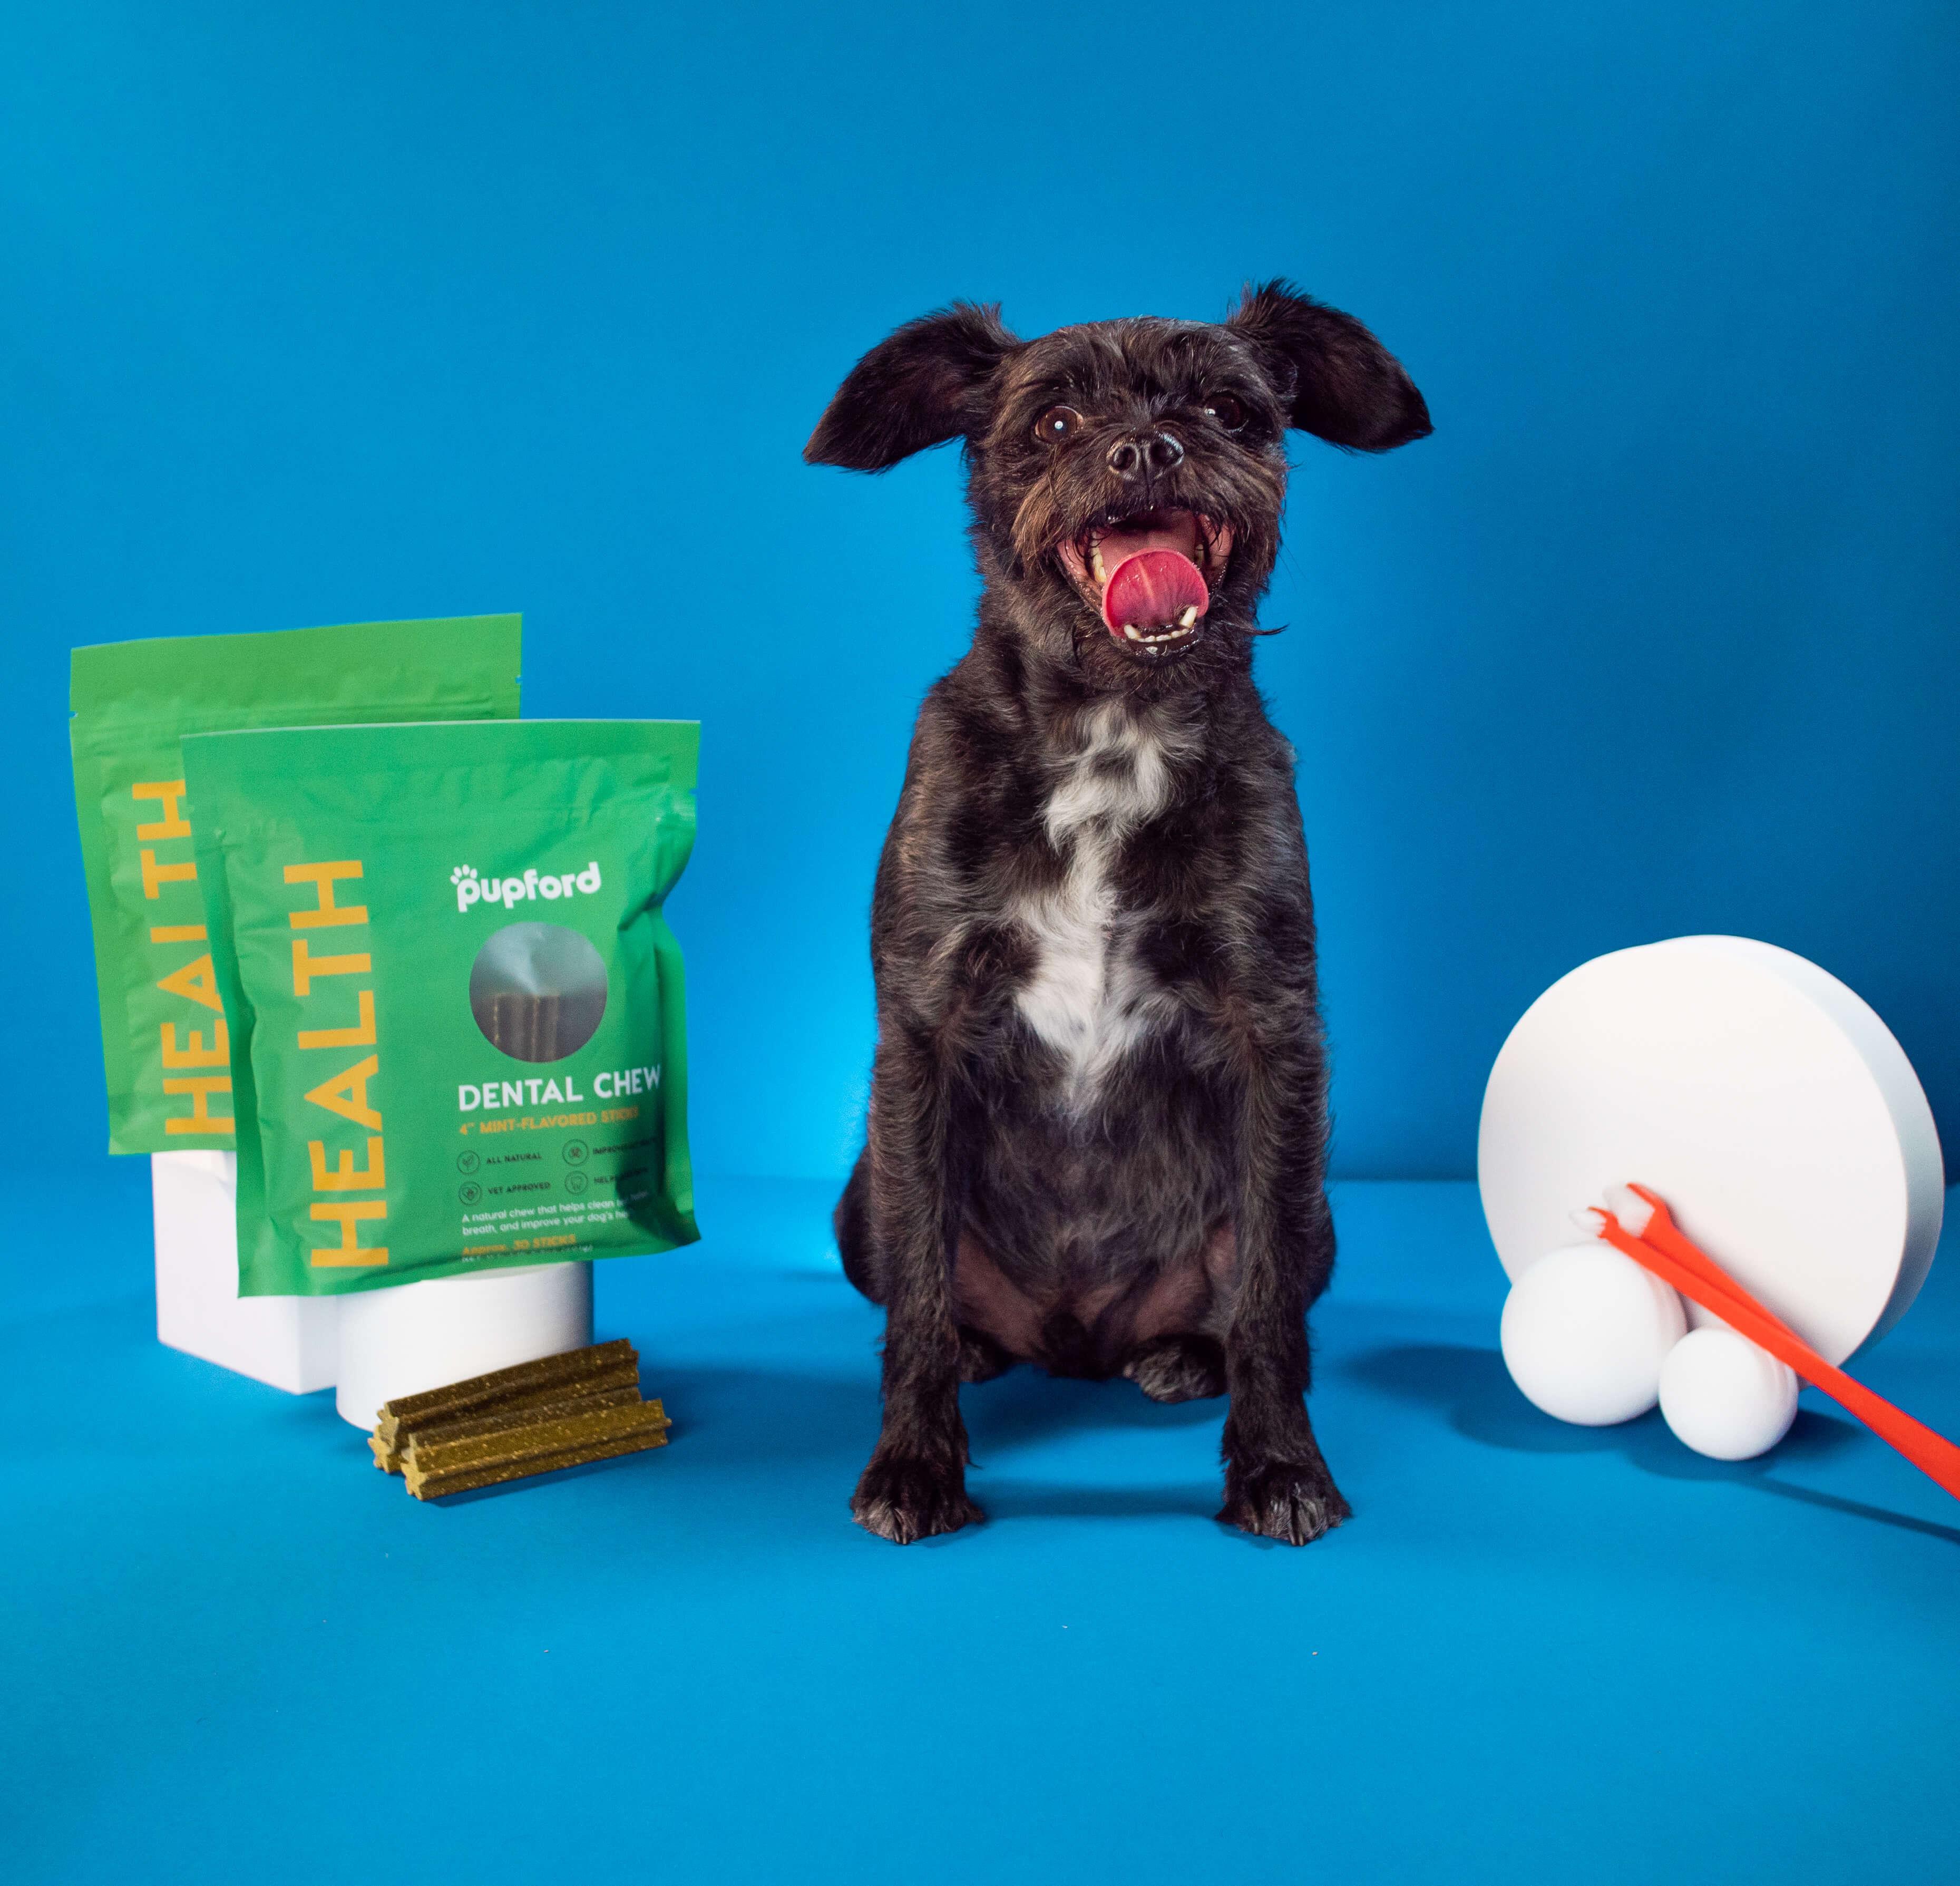 dog next to dental chews | Pupford